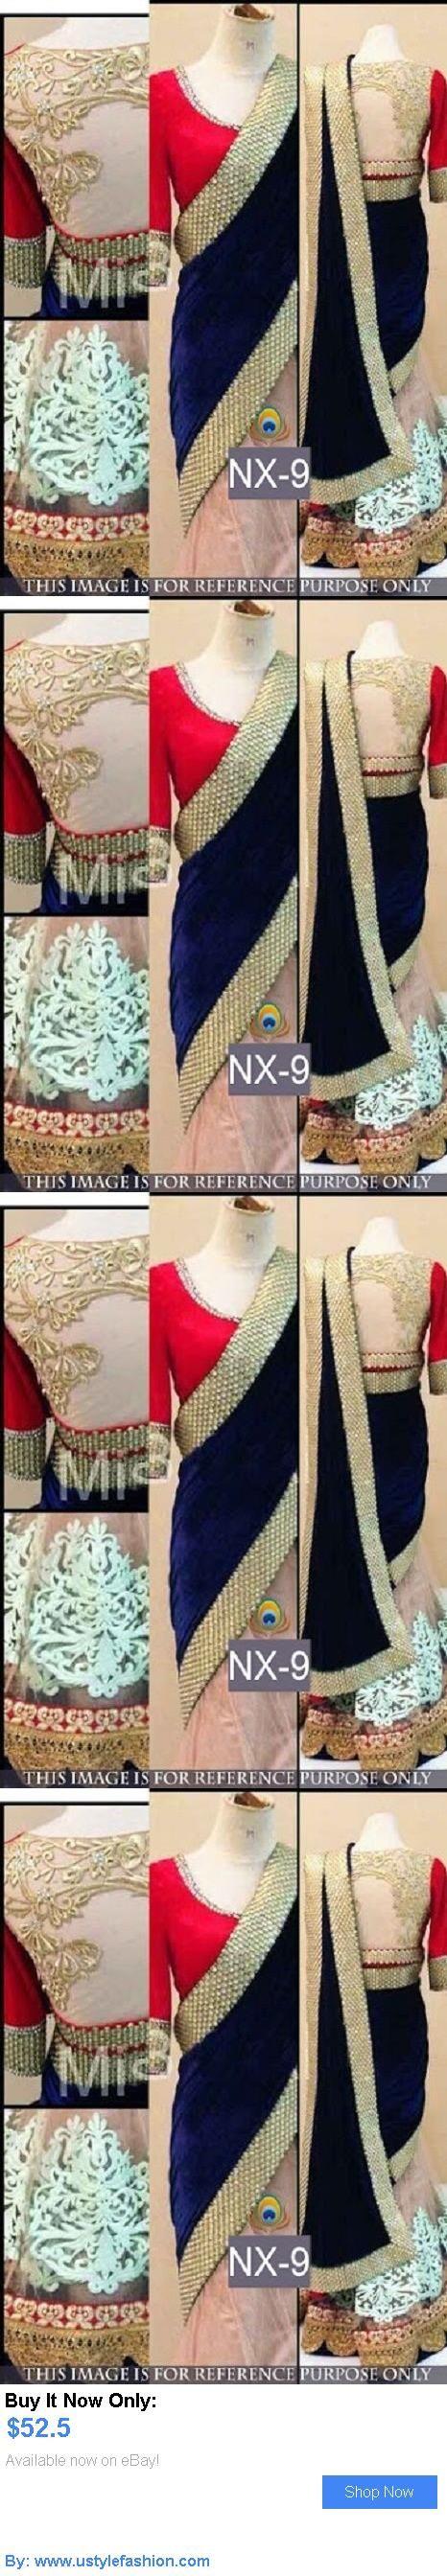 Cultural and ethnic clothing: Designer Party Wear Wedding Indian Pakistani Saree Sari Bollywood Ethnic Lehenga BUY IT NOW ONLY: $52.5 #ustylefashionCulturalandethnicclothing OR #ustylefashion